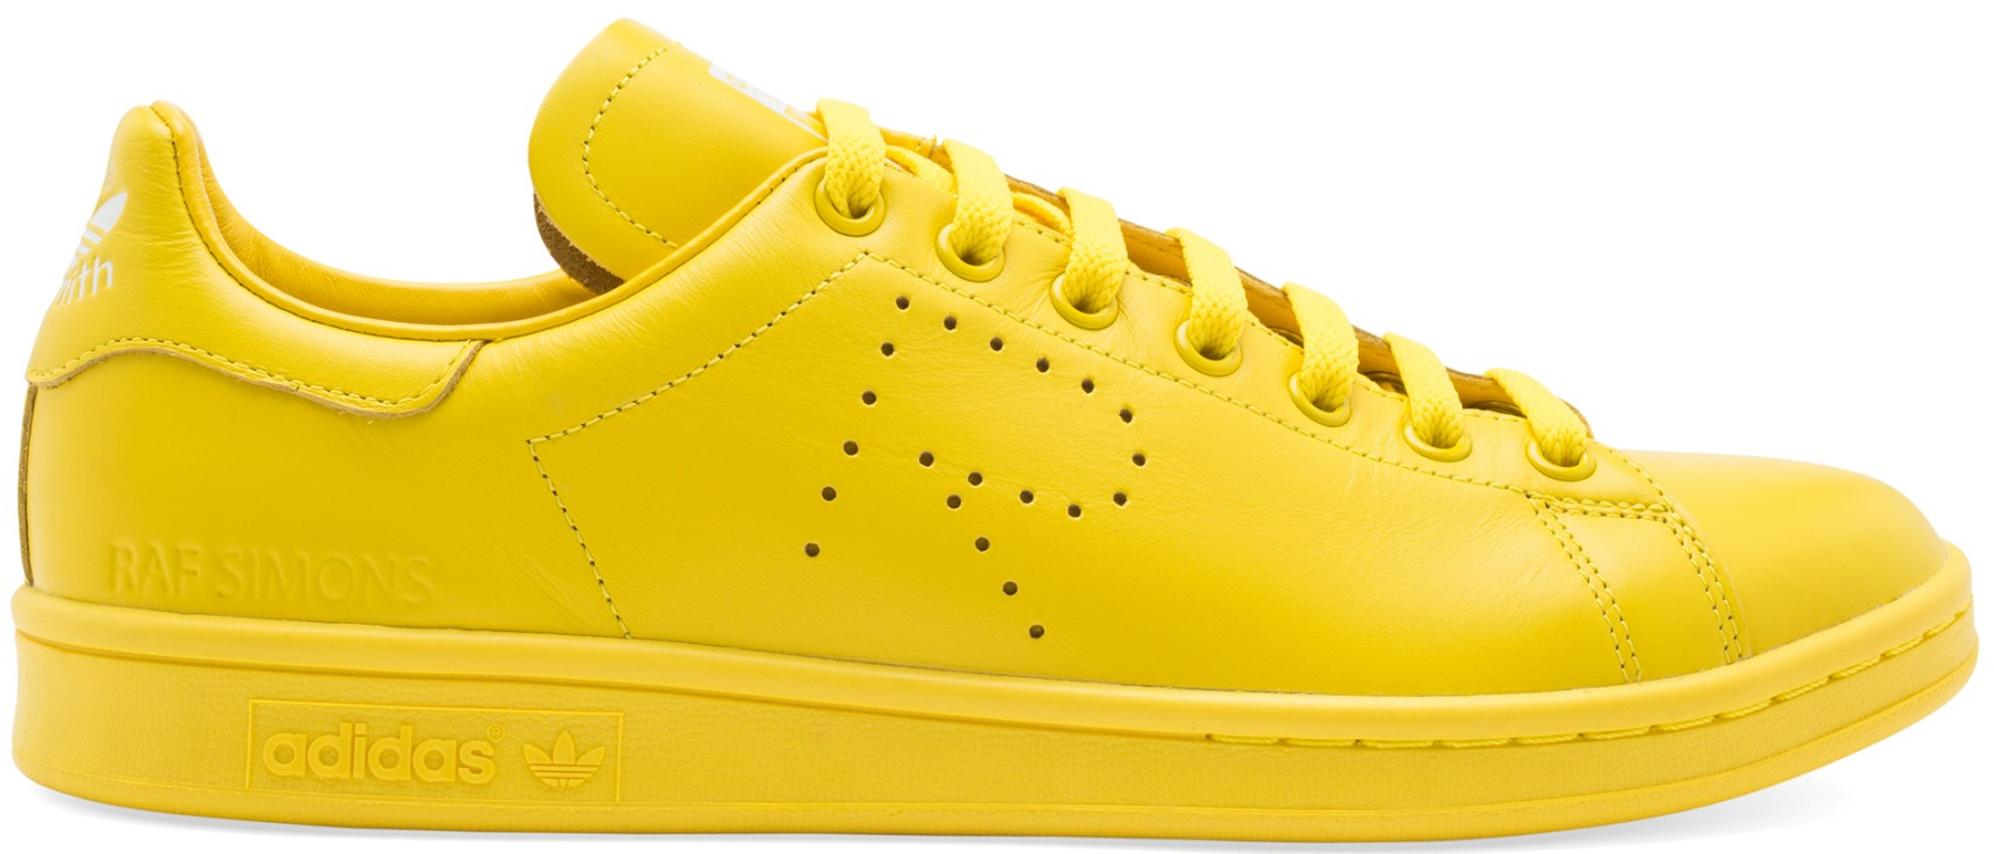 adidas by raf simons - Travbeast 992d3bee4